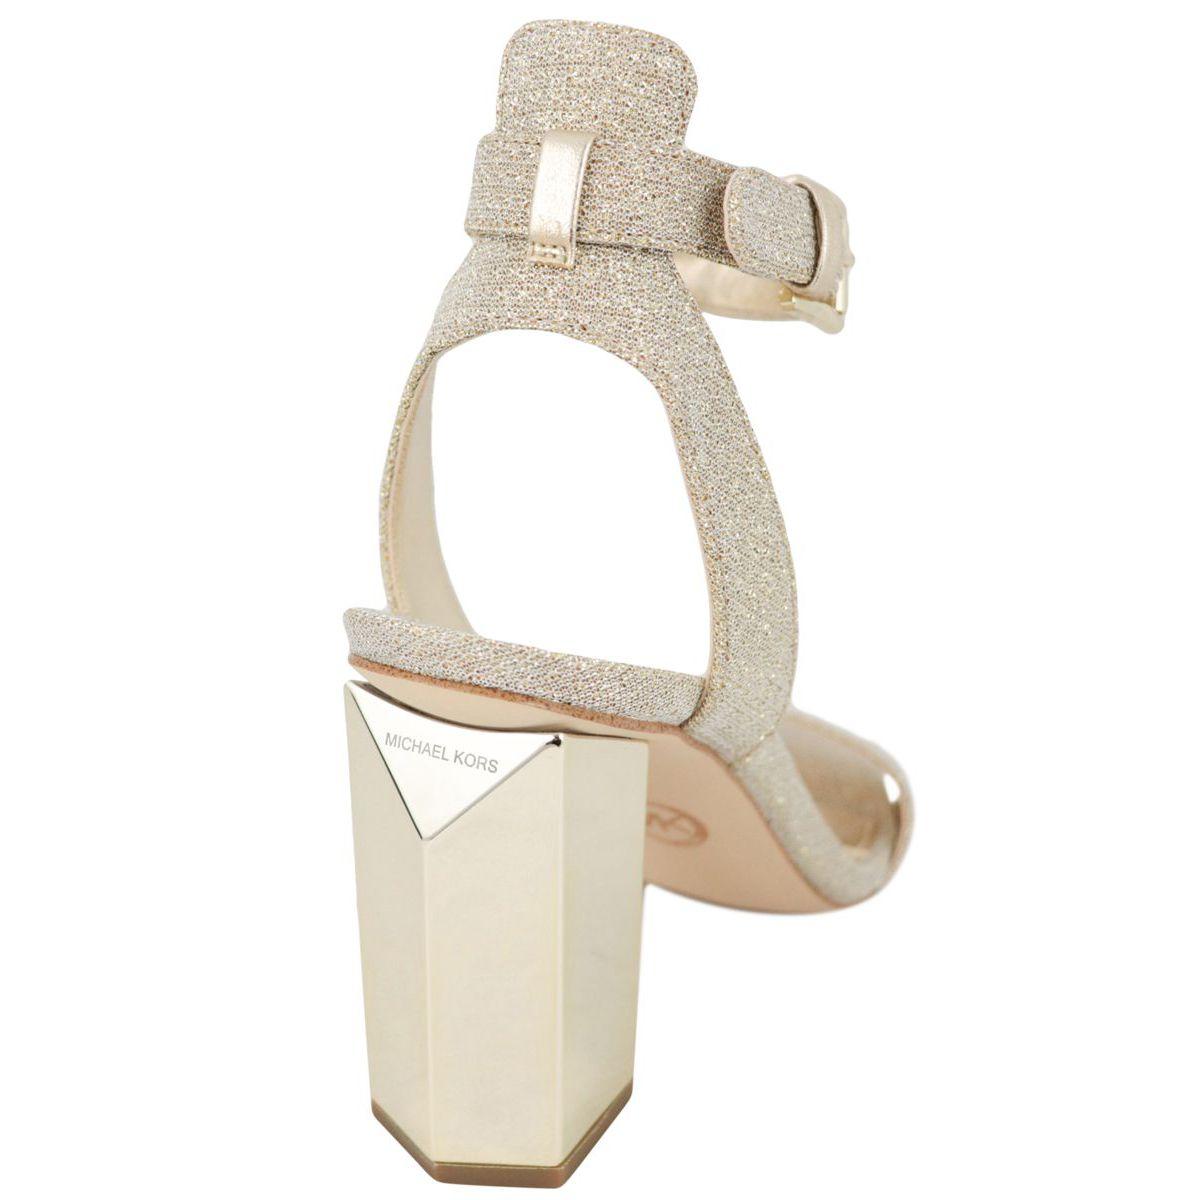 Sandal PETRA ANKLE STRAP Gold Michael Kors